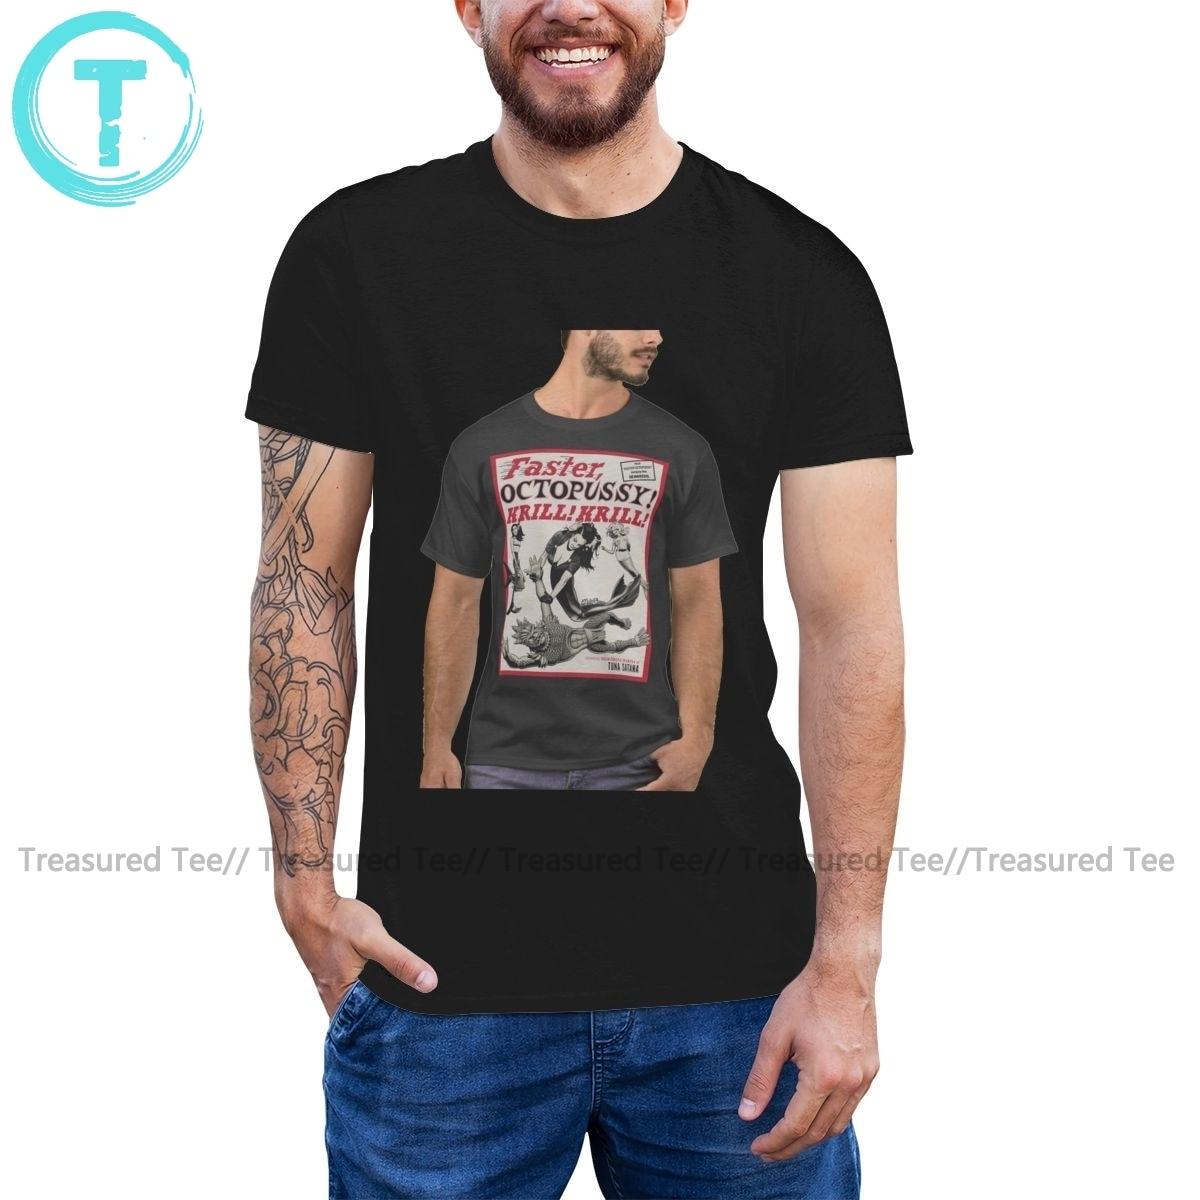 Футболка Satana футболка с короткими рукавами из 100% хлопка